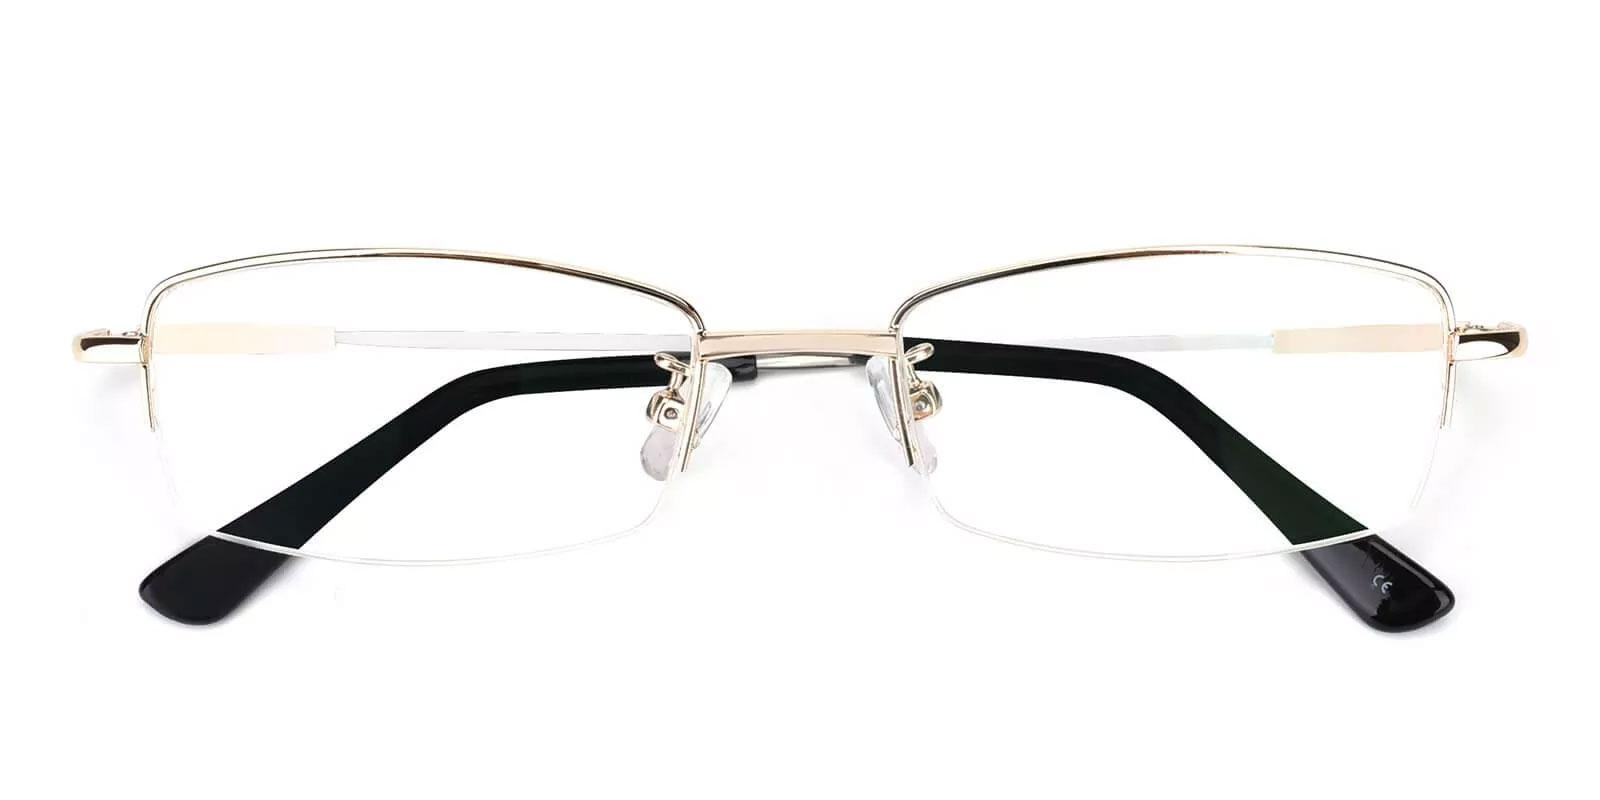 Benjamin Gold Metal Eyeglasses , NosePads Frames from ABBE Glasses